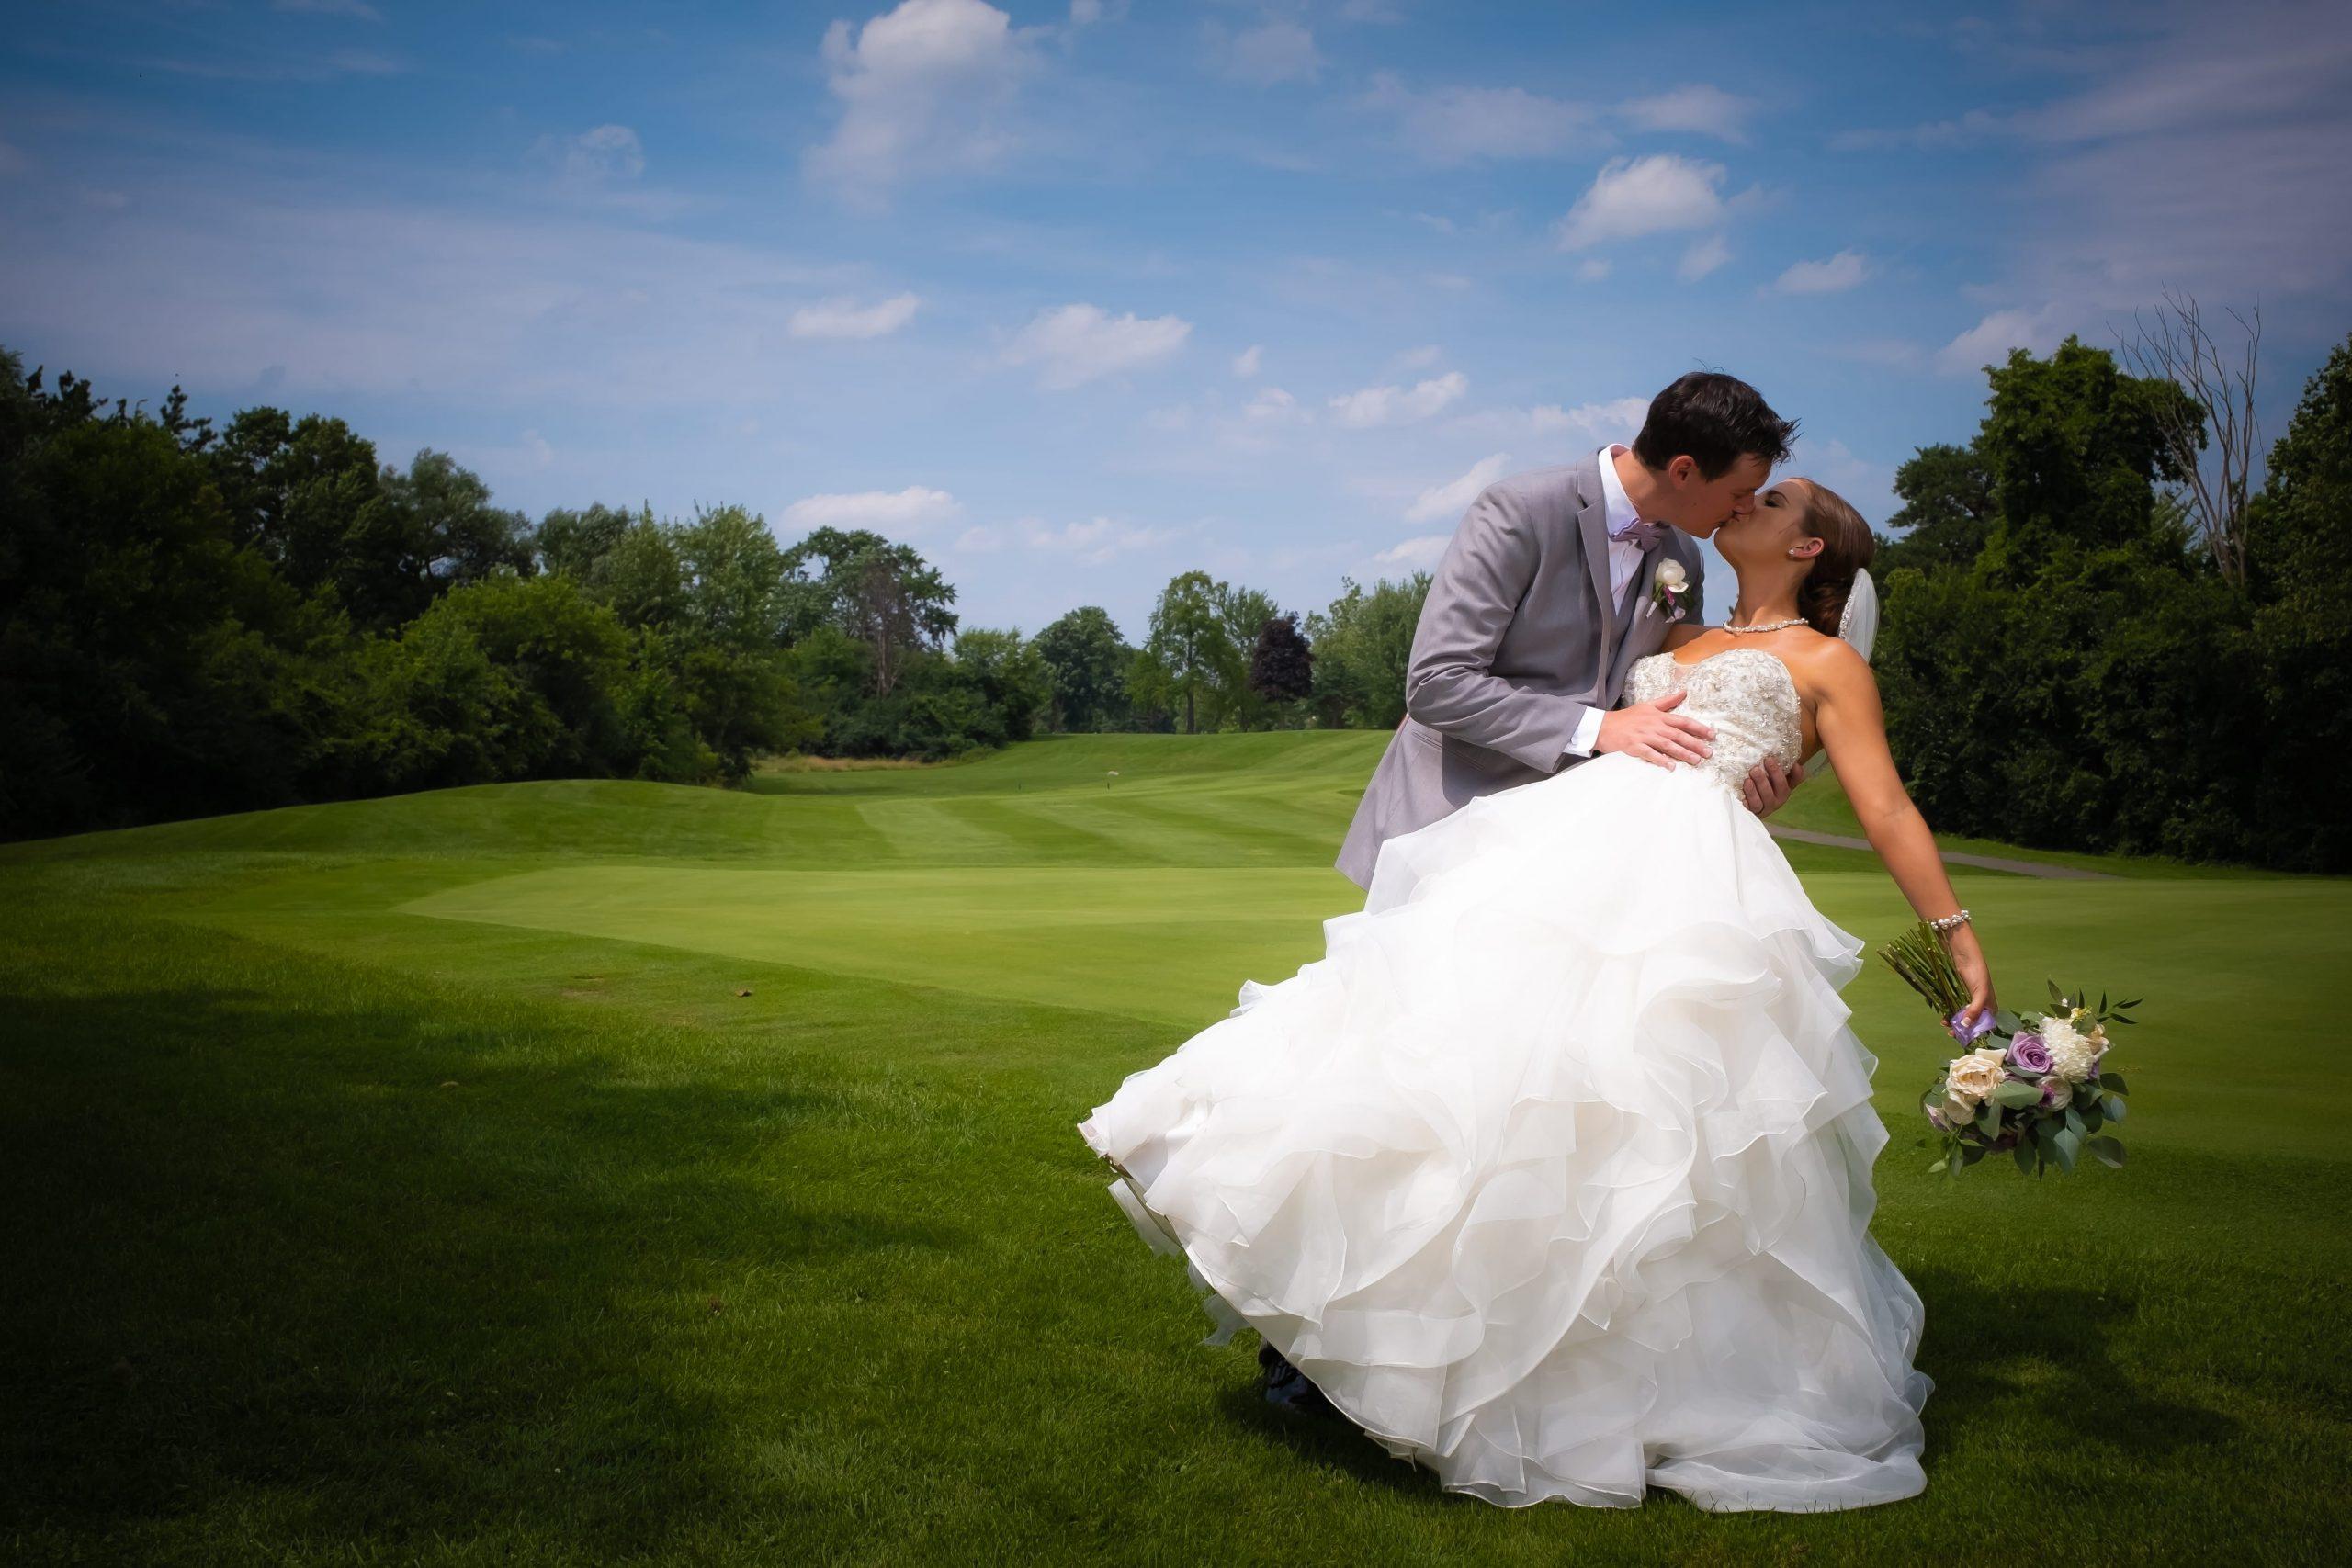 wedding romantics on golf course